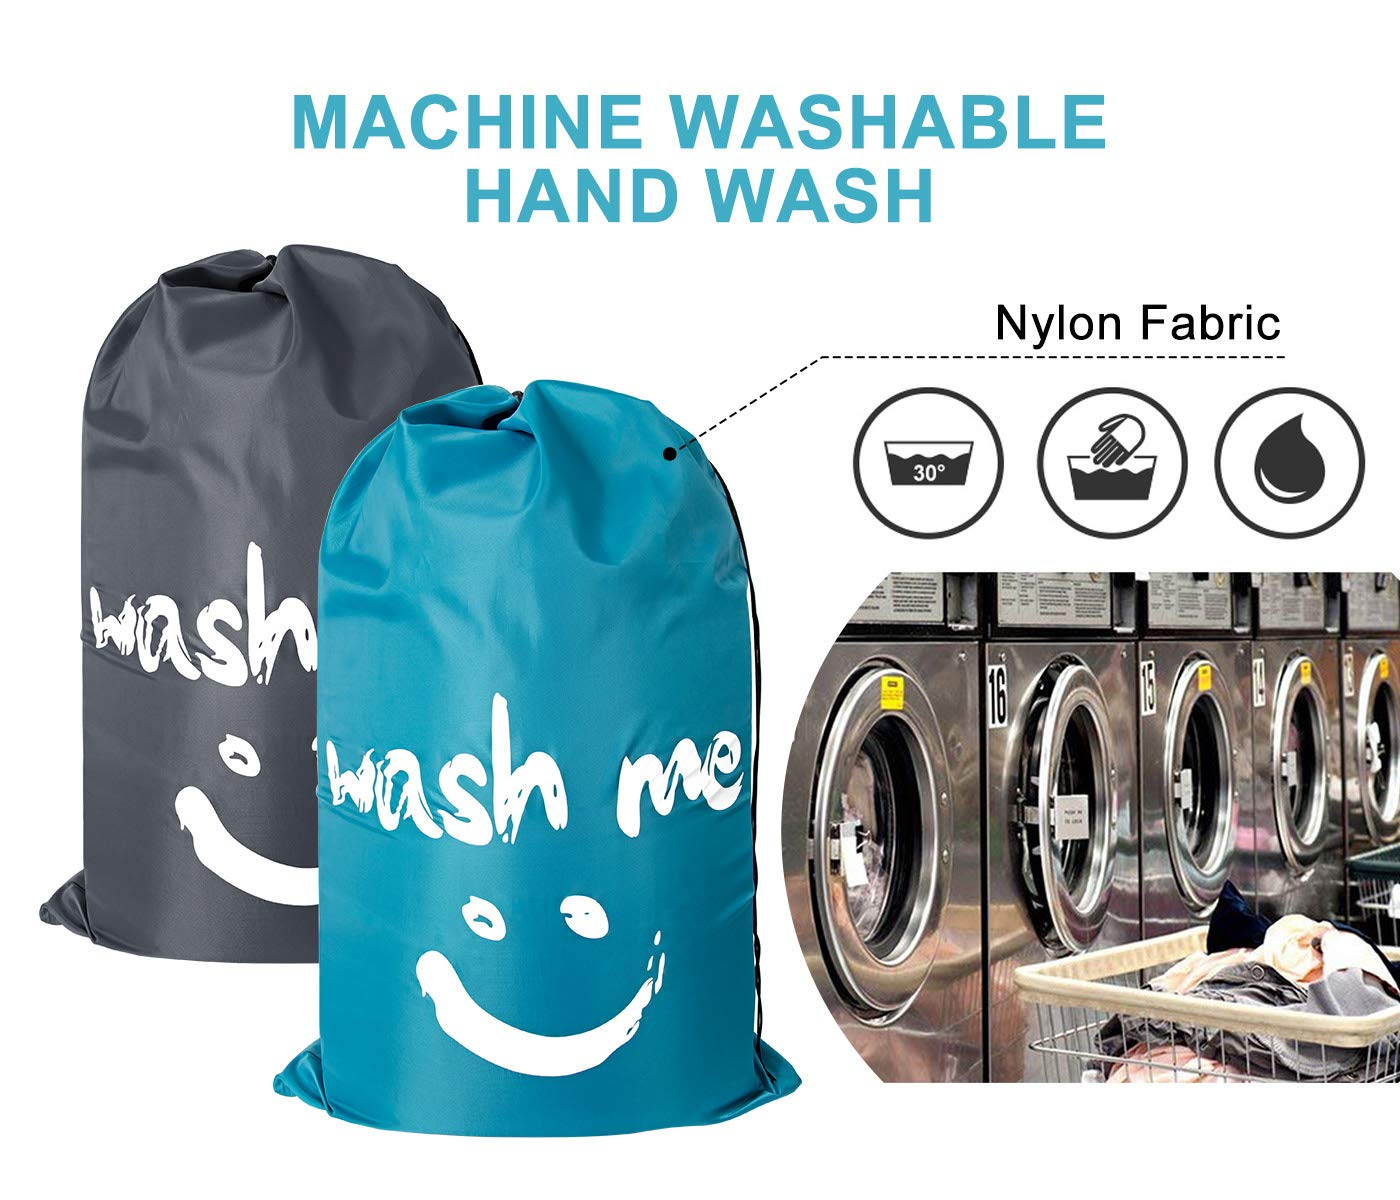 ZERO JET LAG 2 Pack Extra Large Travel Laundry Bag Set Nylon Rip-Stop Dirty Storage Bag Machine Washable Drawstring Closure 24'' x 36'' (Blue and Gray) by ZERO JET LAG (Image #6)